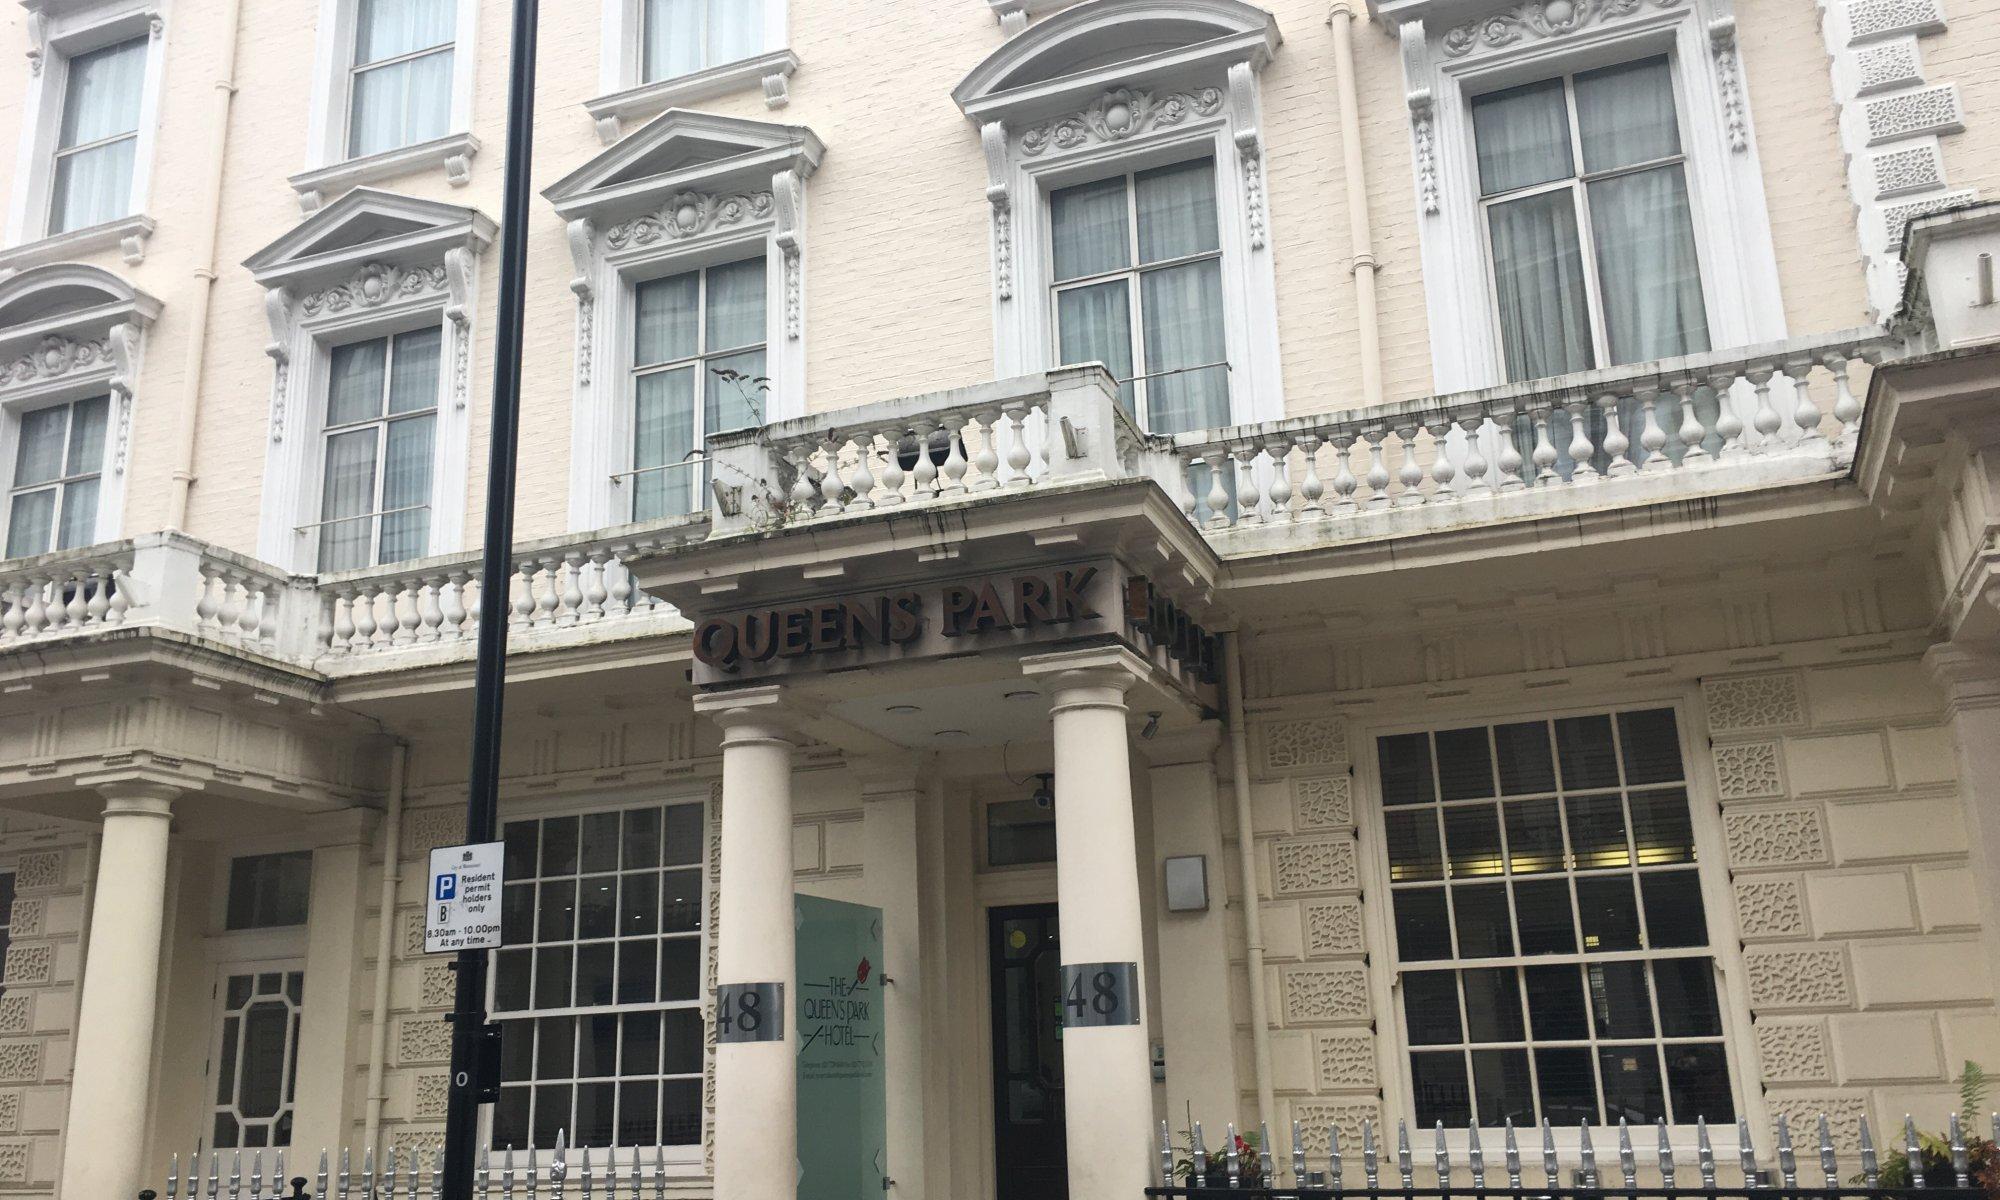 Queens Park Hotel, London, England